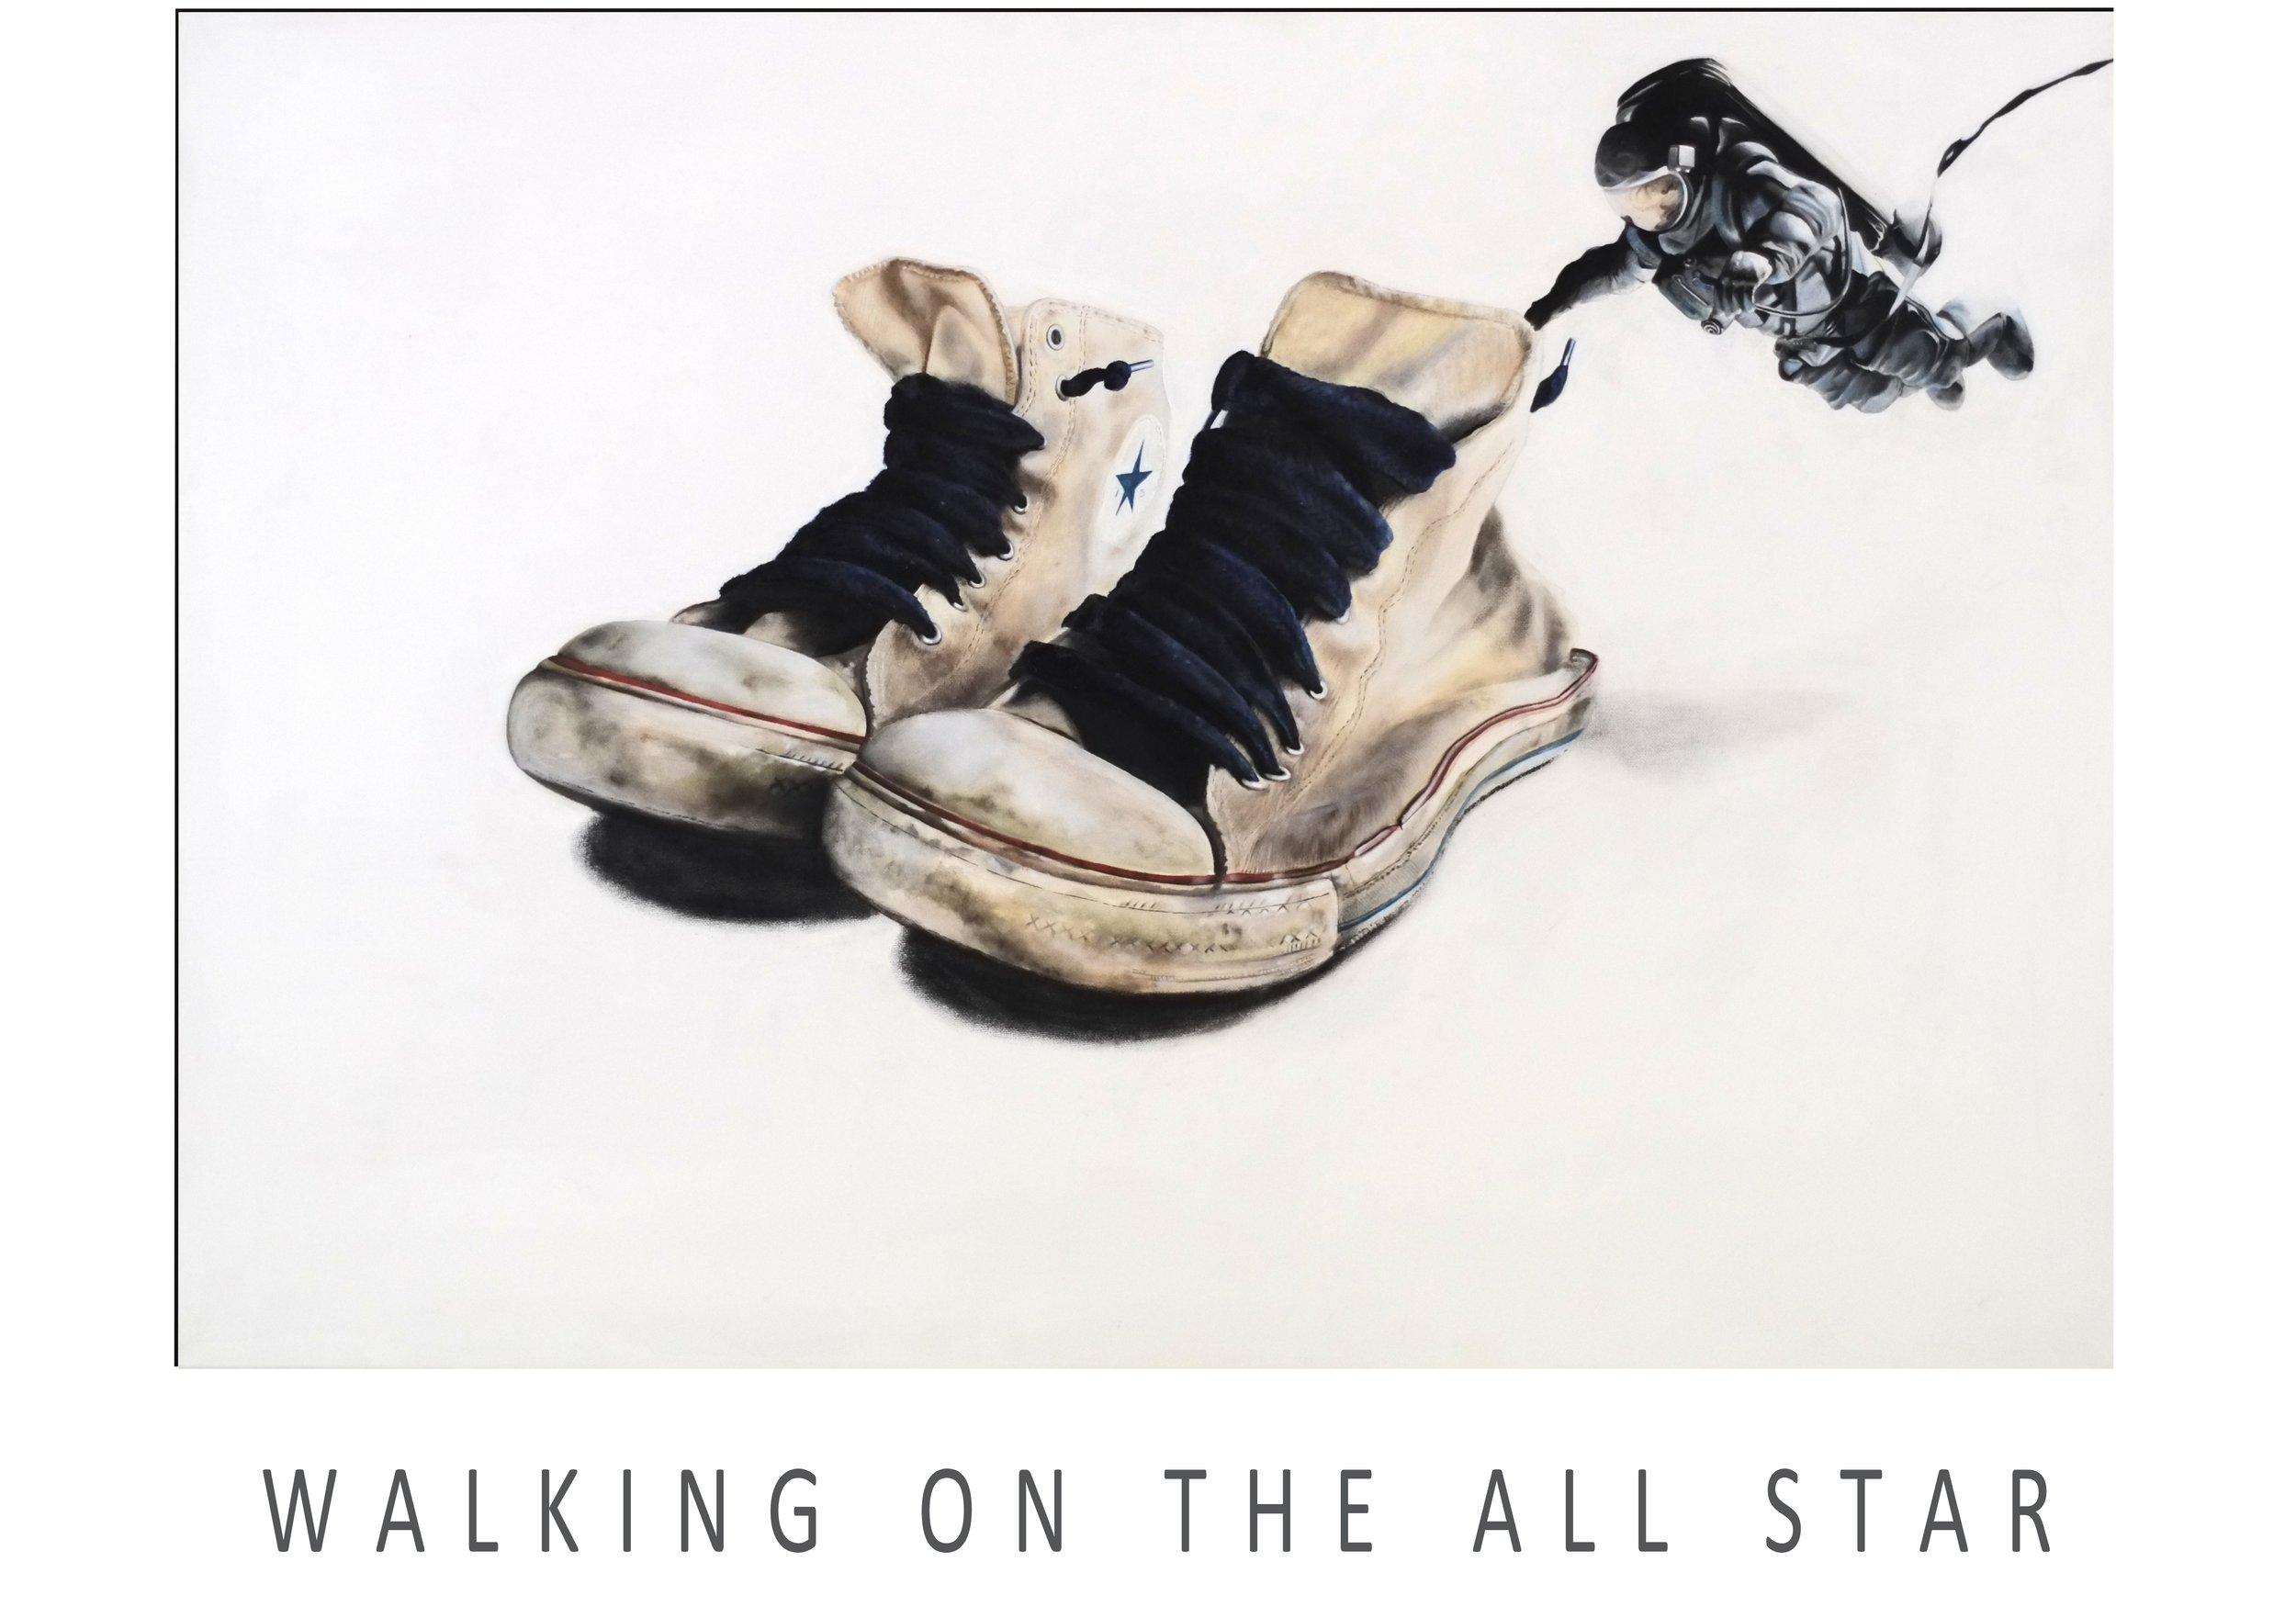 WALKING ON THE ALL STAR-1-Pagina001.jpeg